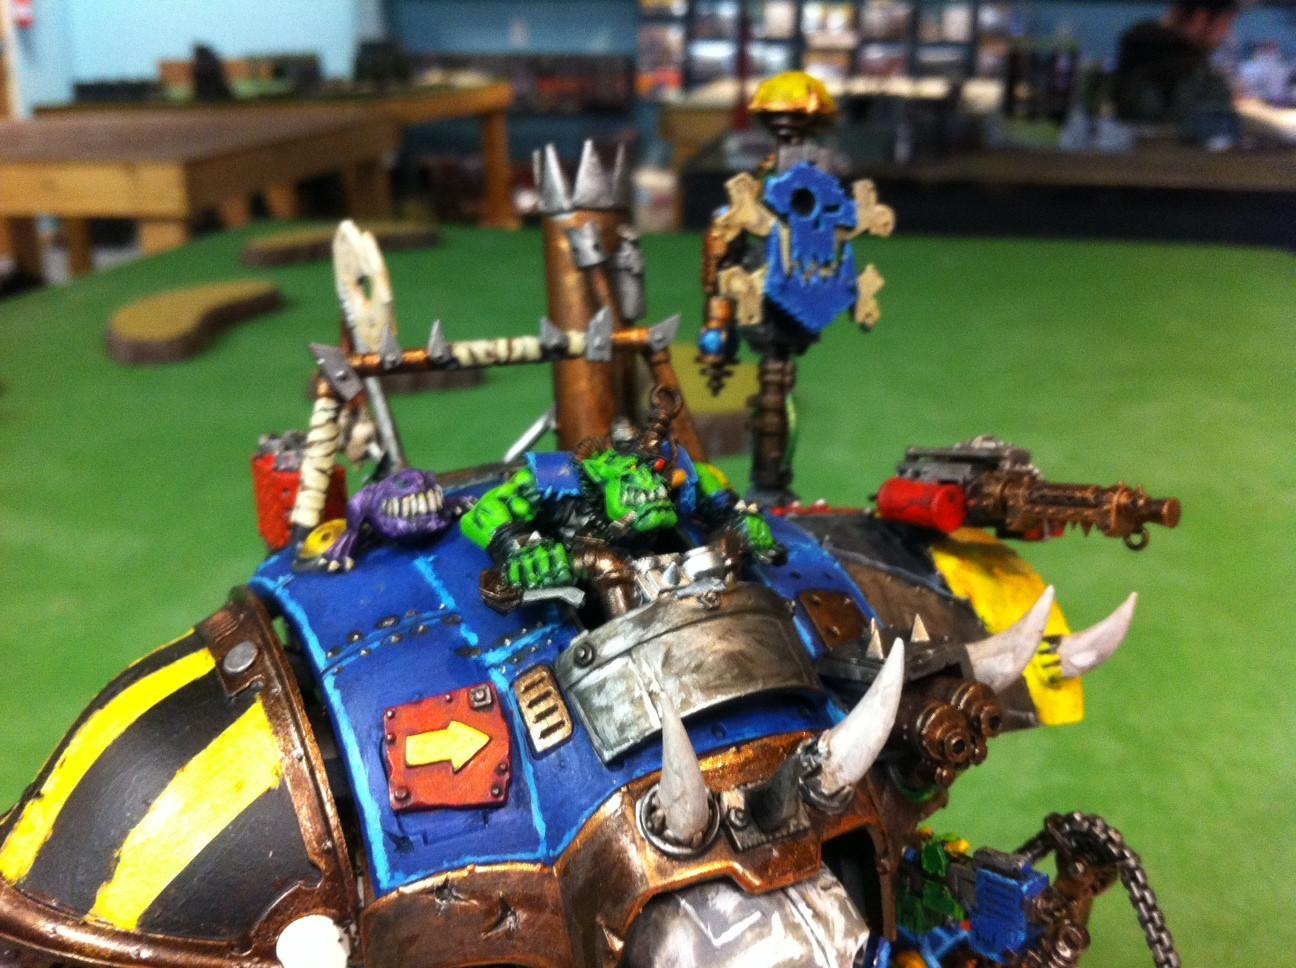 Big Mek, Conversion, Knights, Looted, Orks, Stolen, Warhammer 40,000